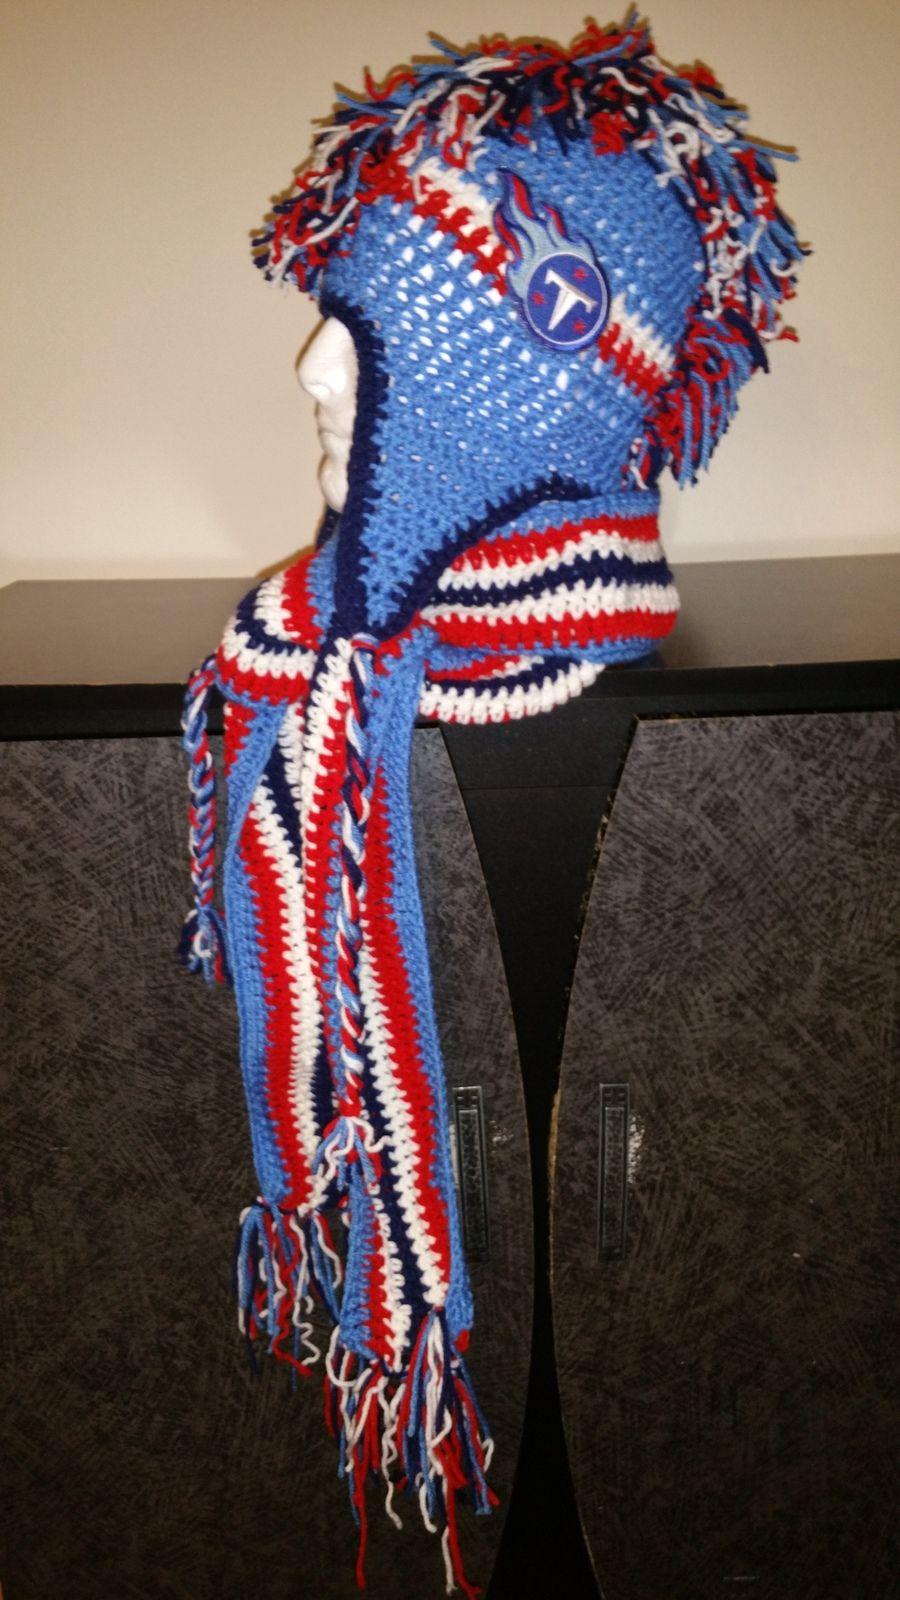 $60 Tennessee Titans Inspired Handmade Crochet Mohawk Hat  http://www.bonanza.com/listings/401111119